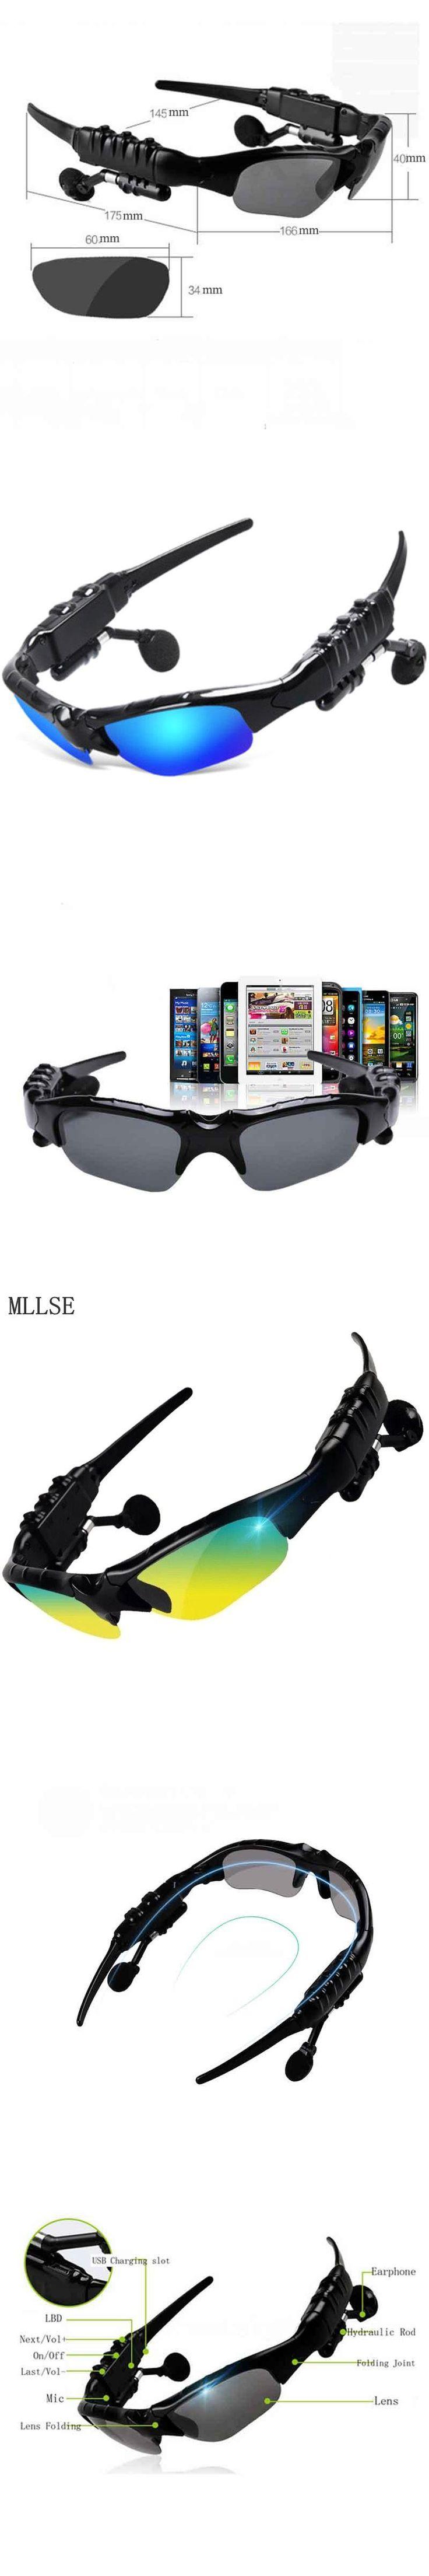 MLLSE Wireless Sunglasses Headphone Bluetooth Headphones Stereo Bluetooth Headset Wireless Earphone for Iphone Samsung Xiaomi